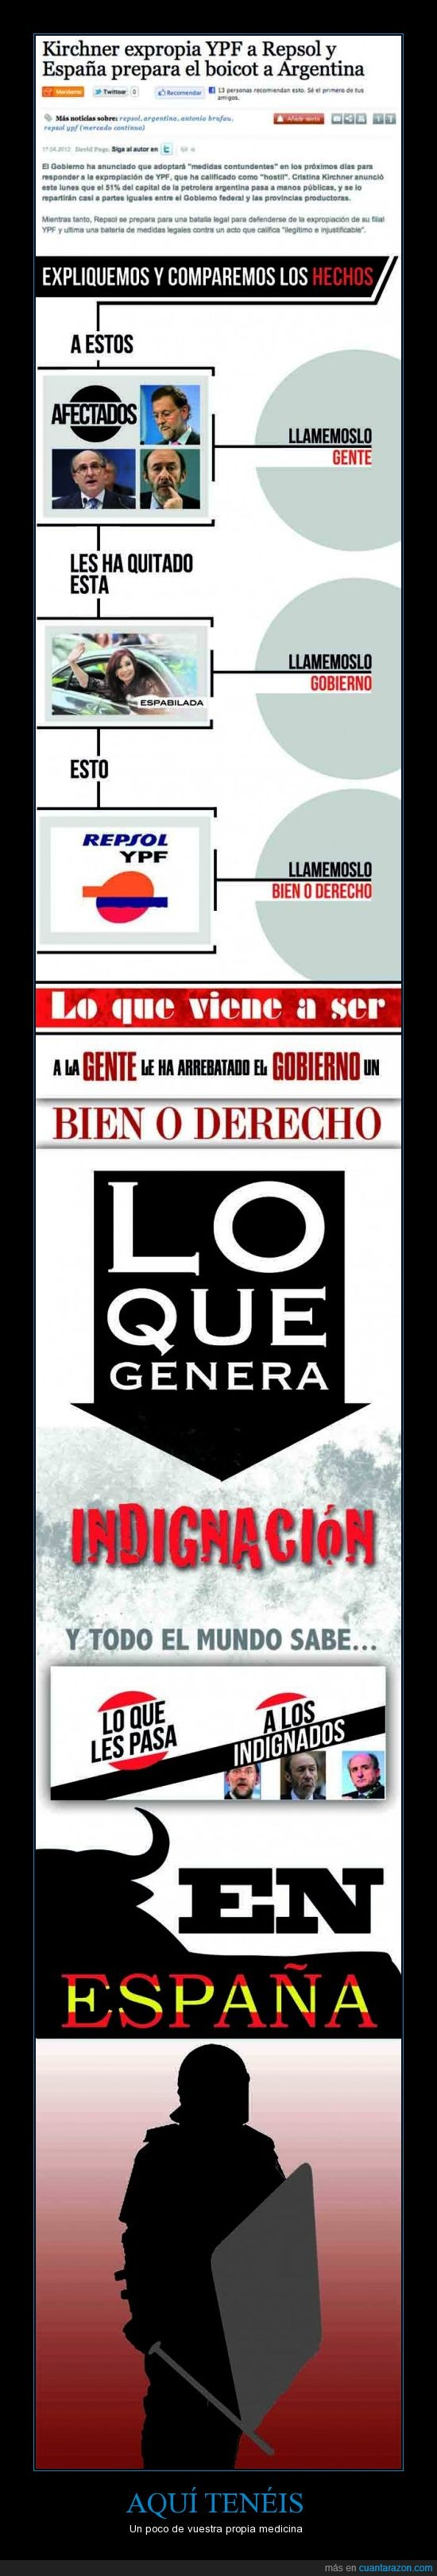 antidisturbios,argentina,democracia,españa,indignados,kirchner,mossos,politica,rajoy,repsol,ypf